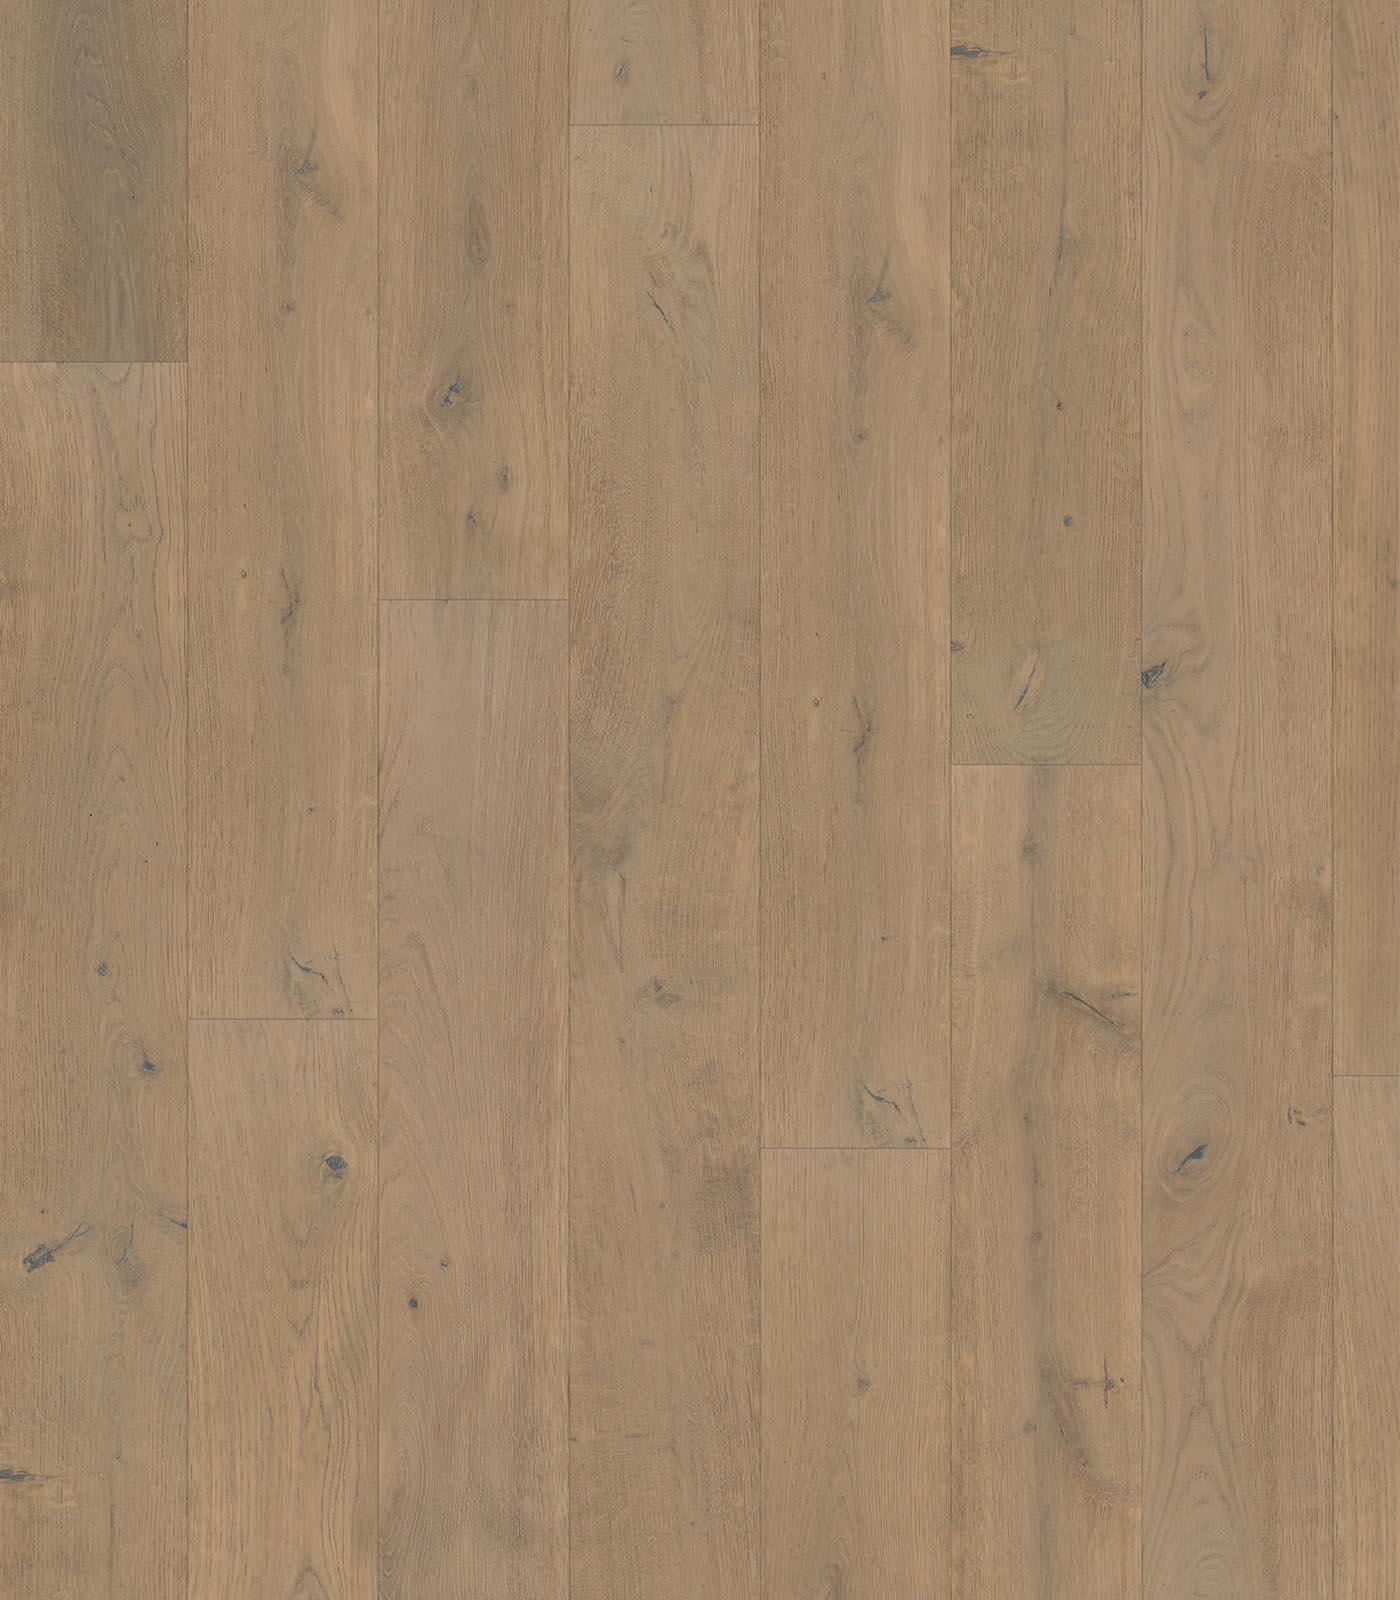 El Mela - European Oak floors-Antique collection